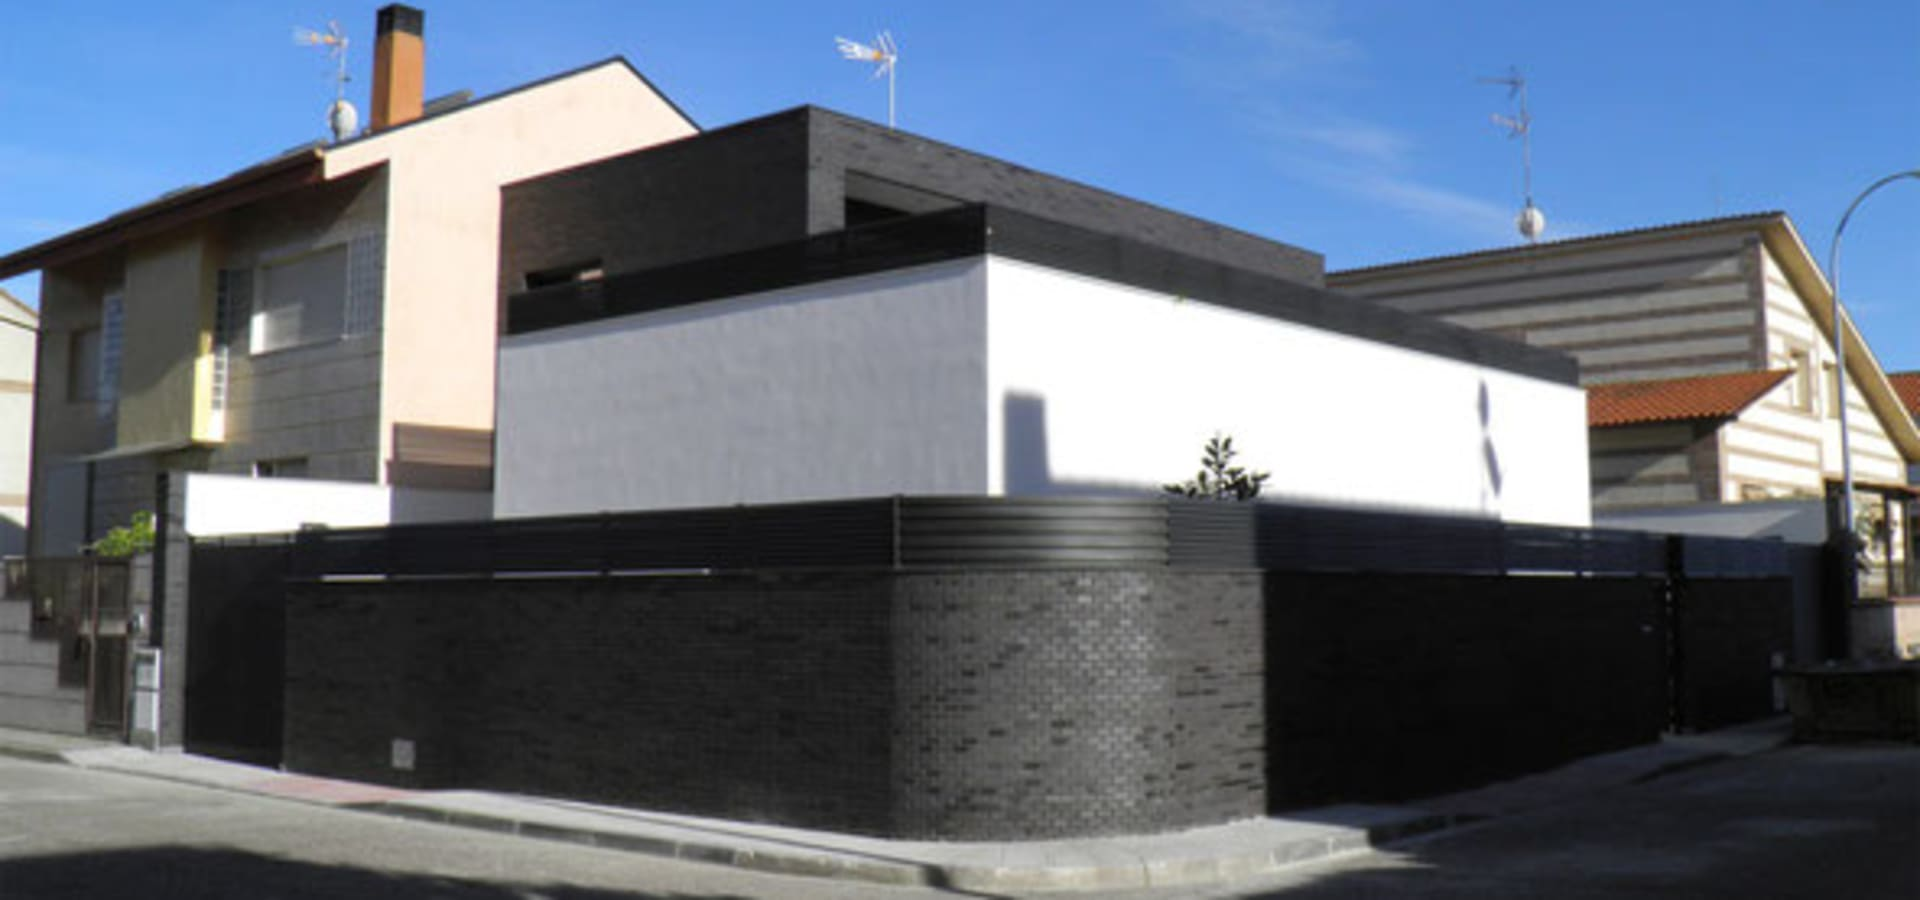 Vivienda unifamiliar toledo by rodrigo p rez estudio de for Estudio de arquitectura